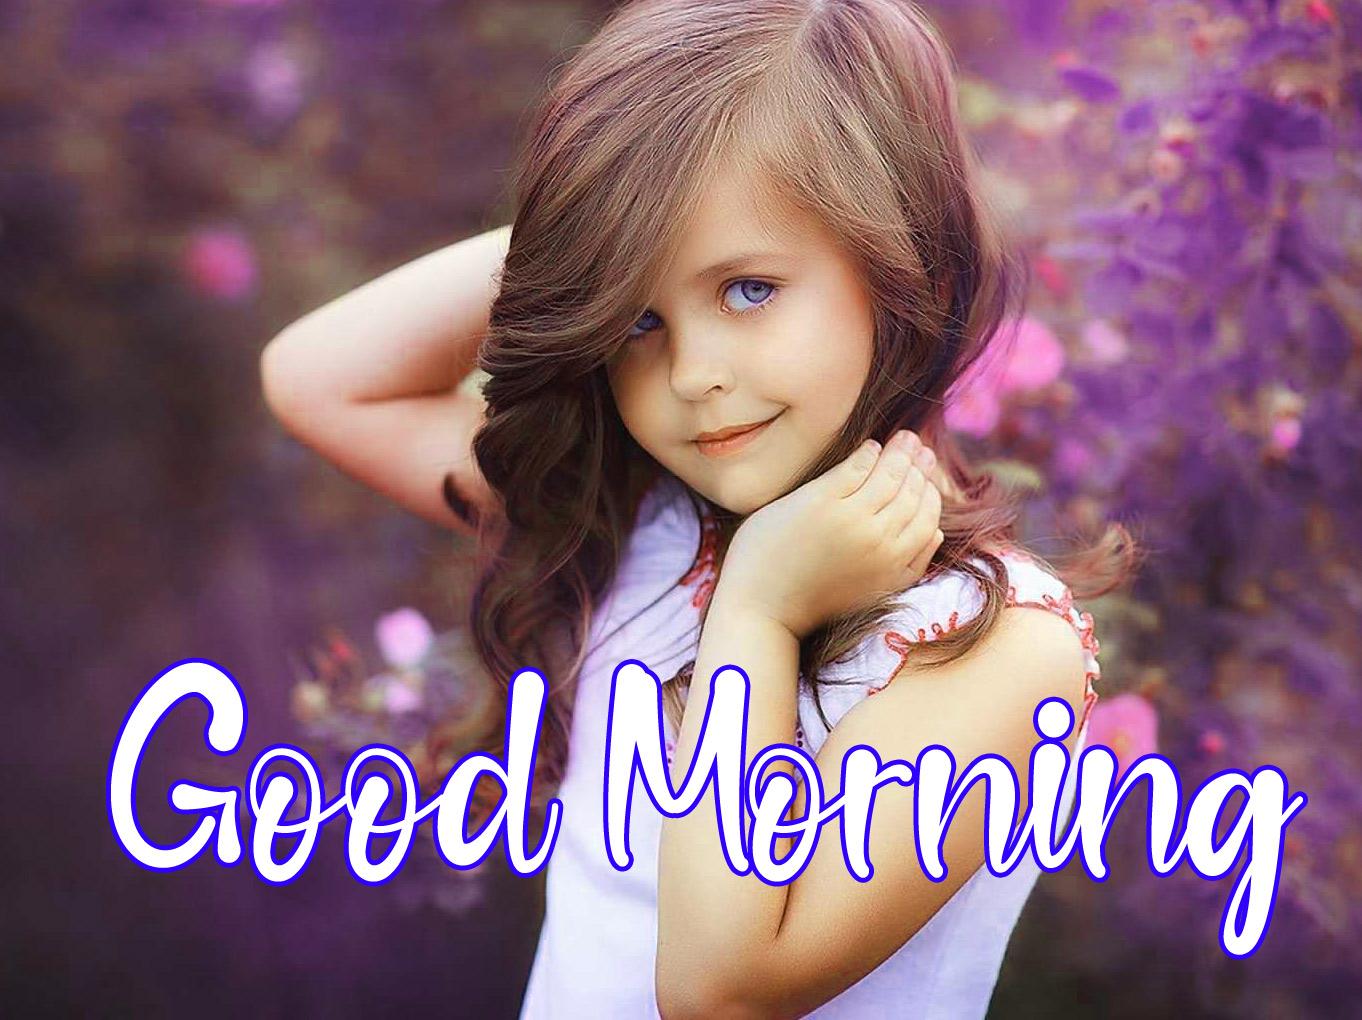 good morning Images for girls 12